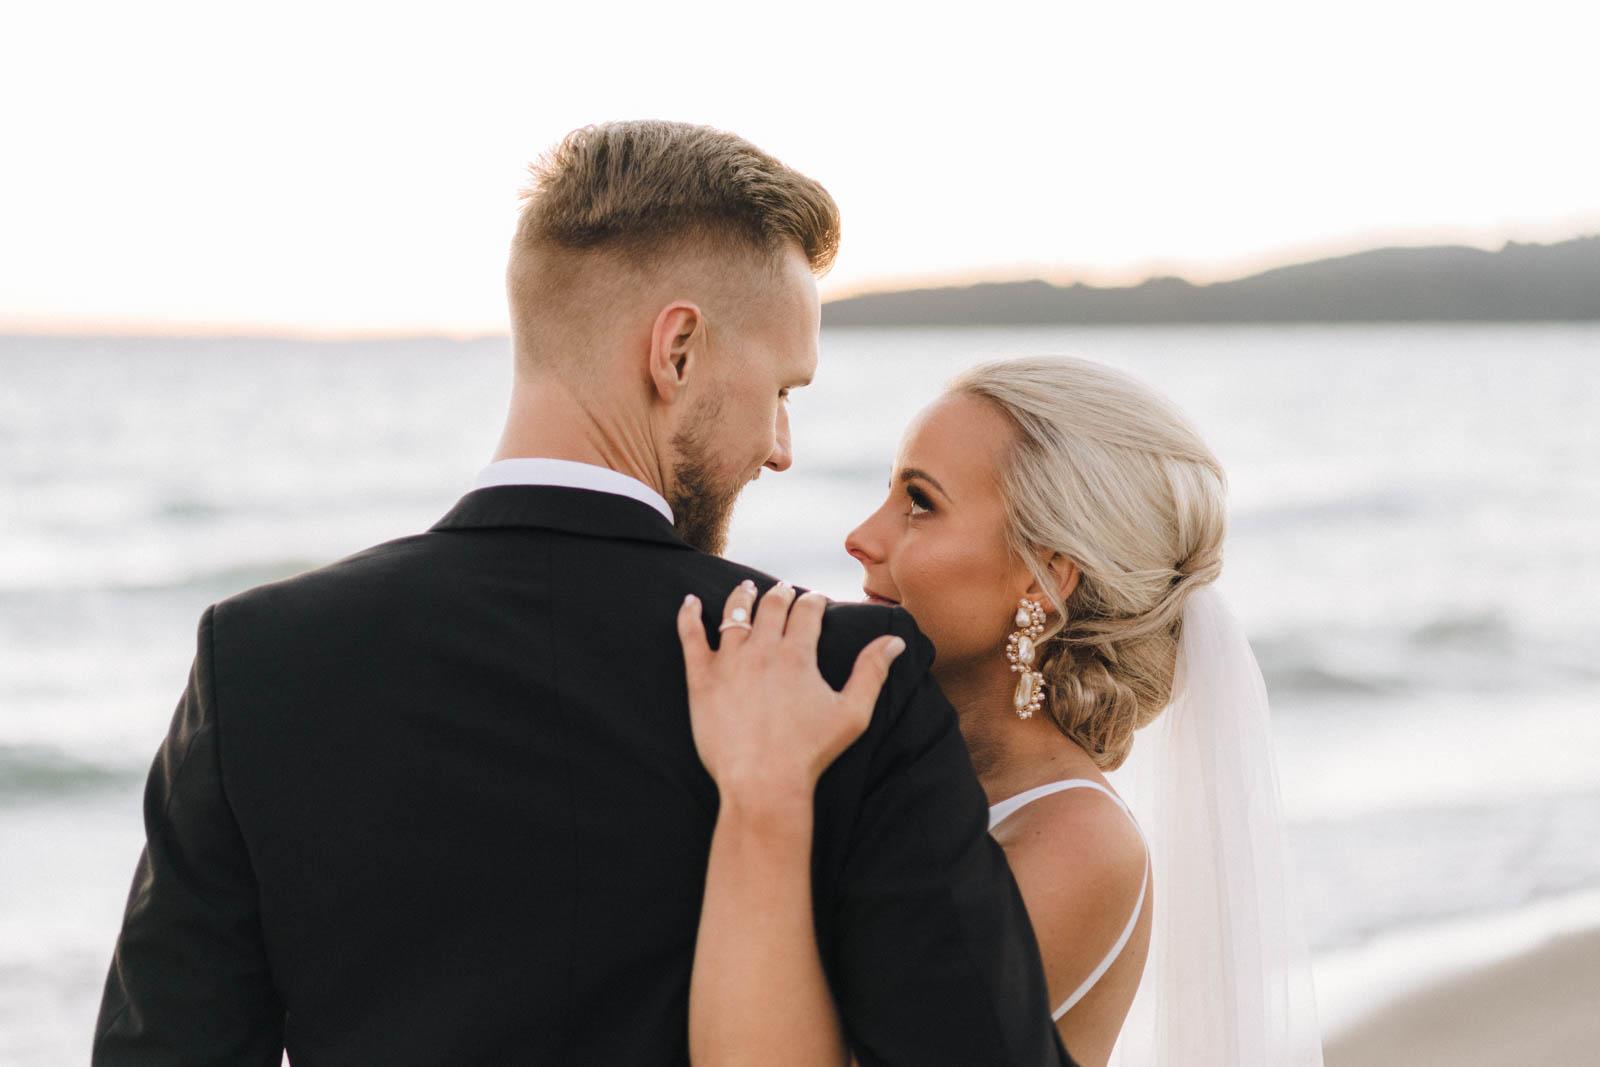 newfound-k-s-hilton-taupo-wedding-photographer-094